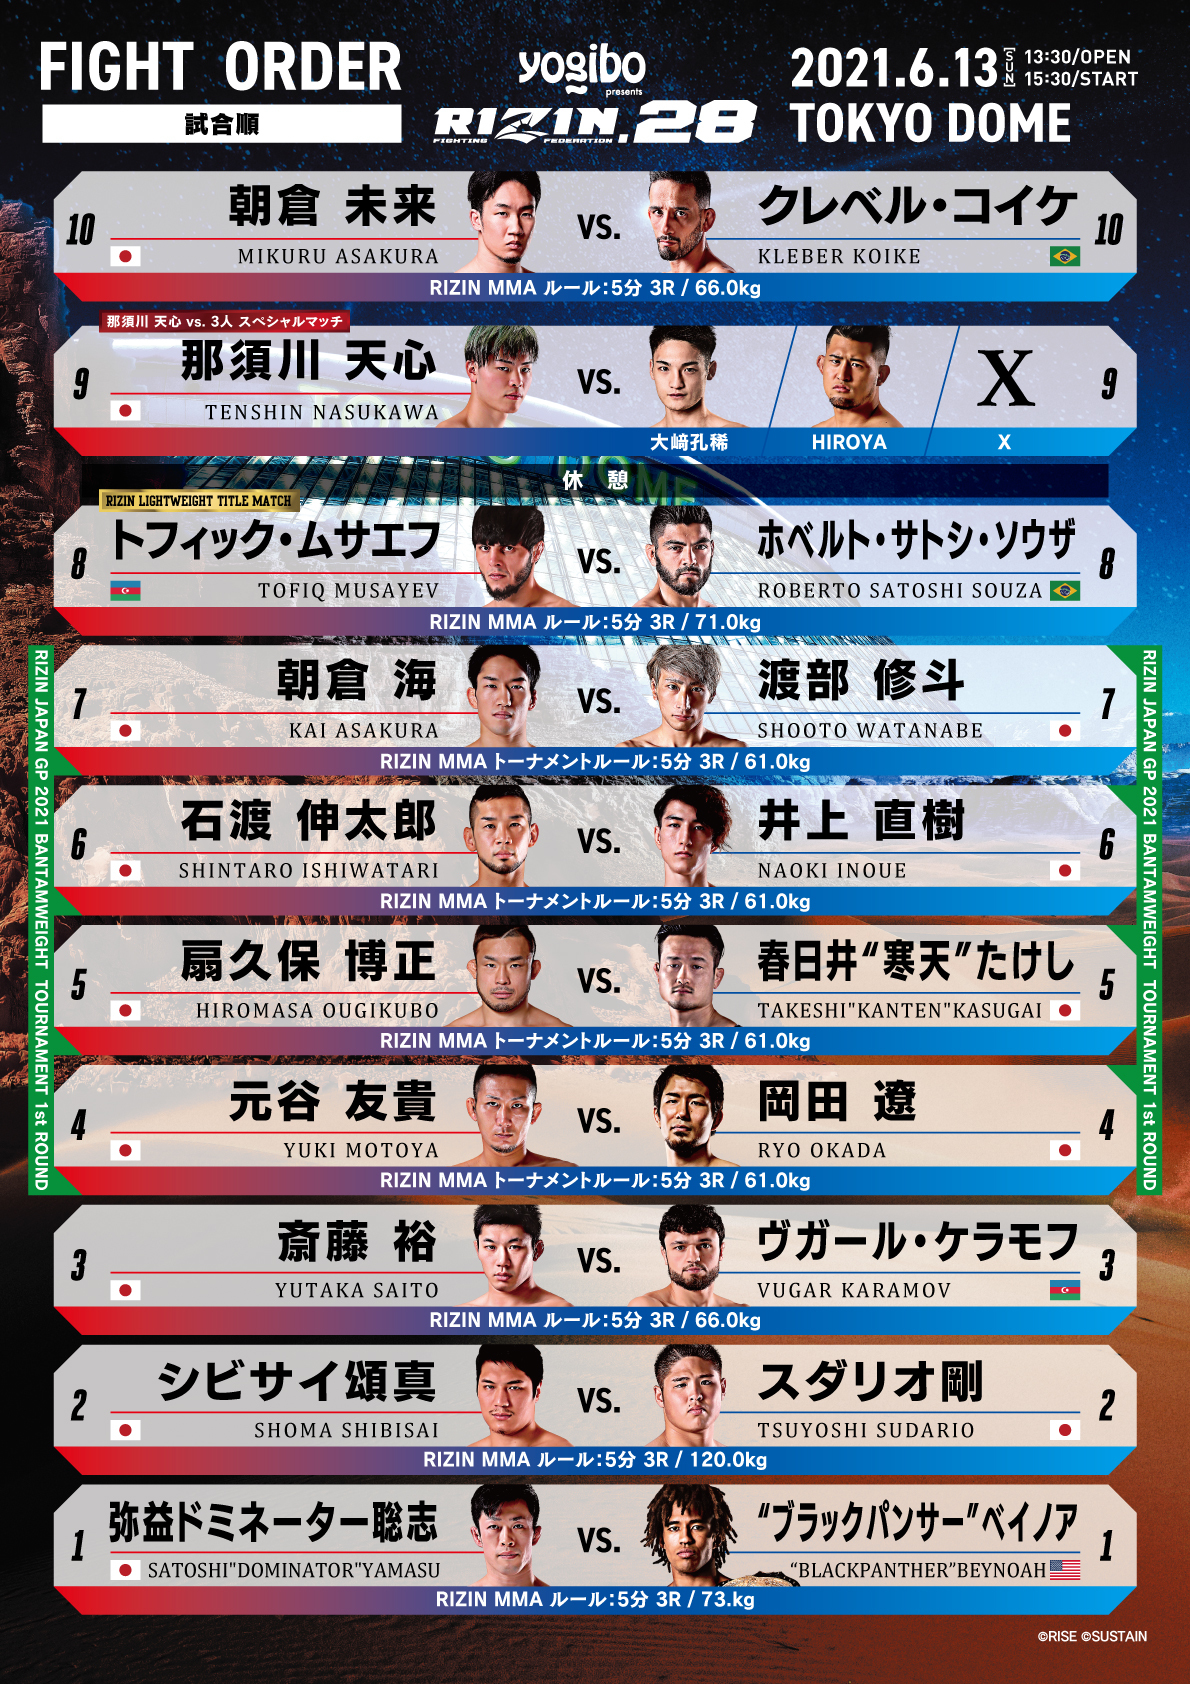 『RIZIN.28』全10カードの試合順